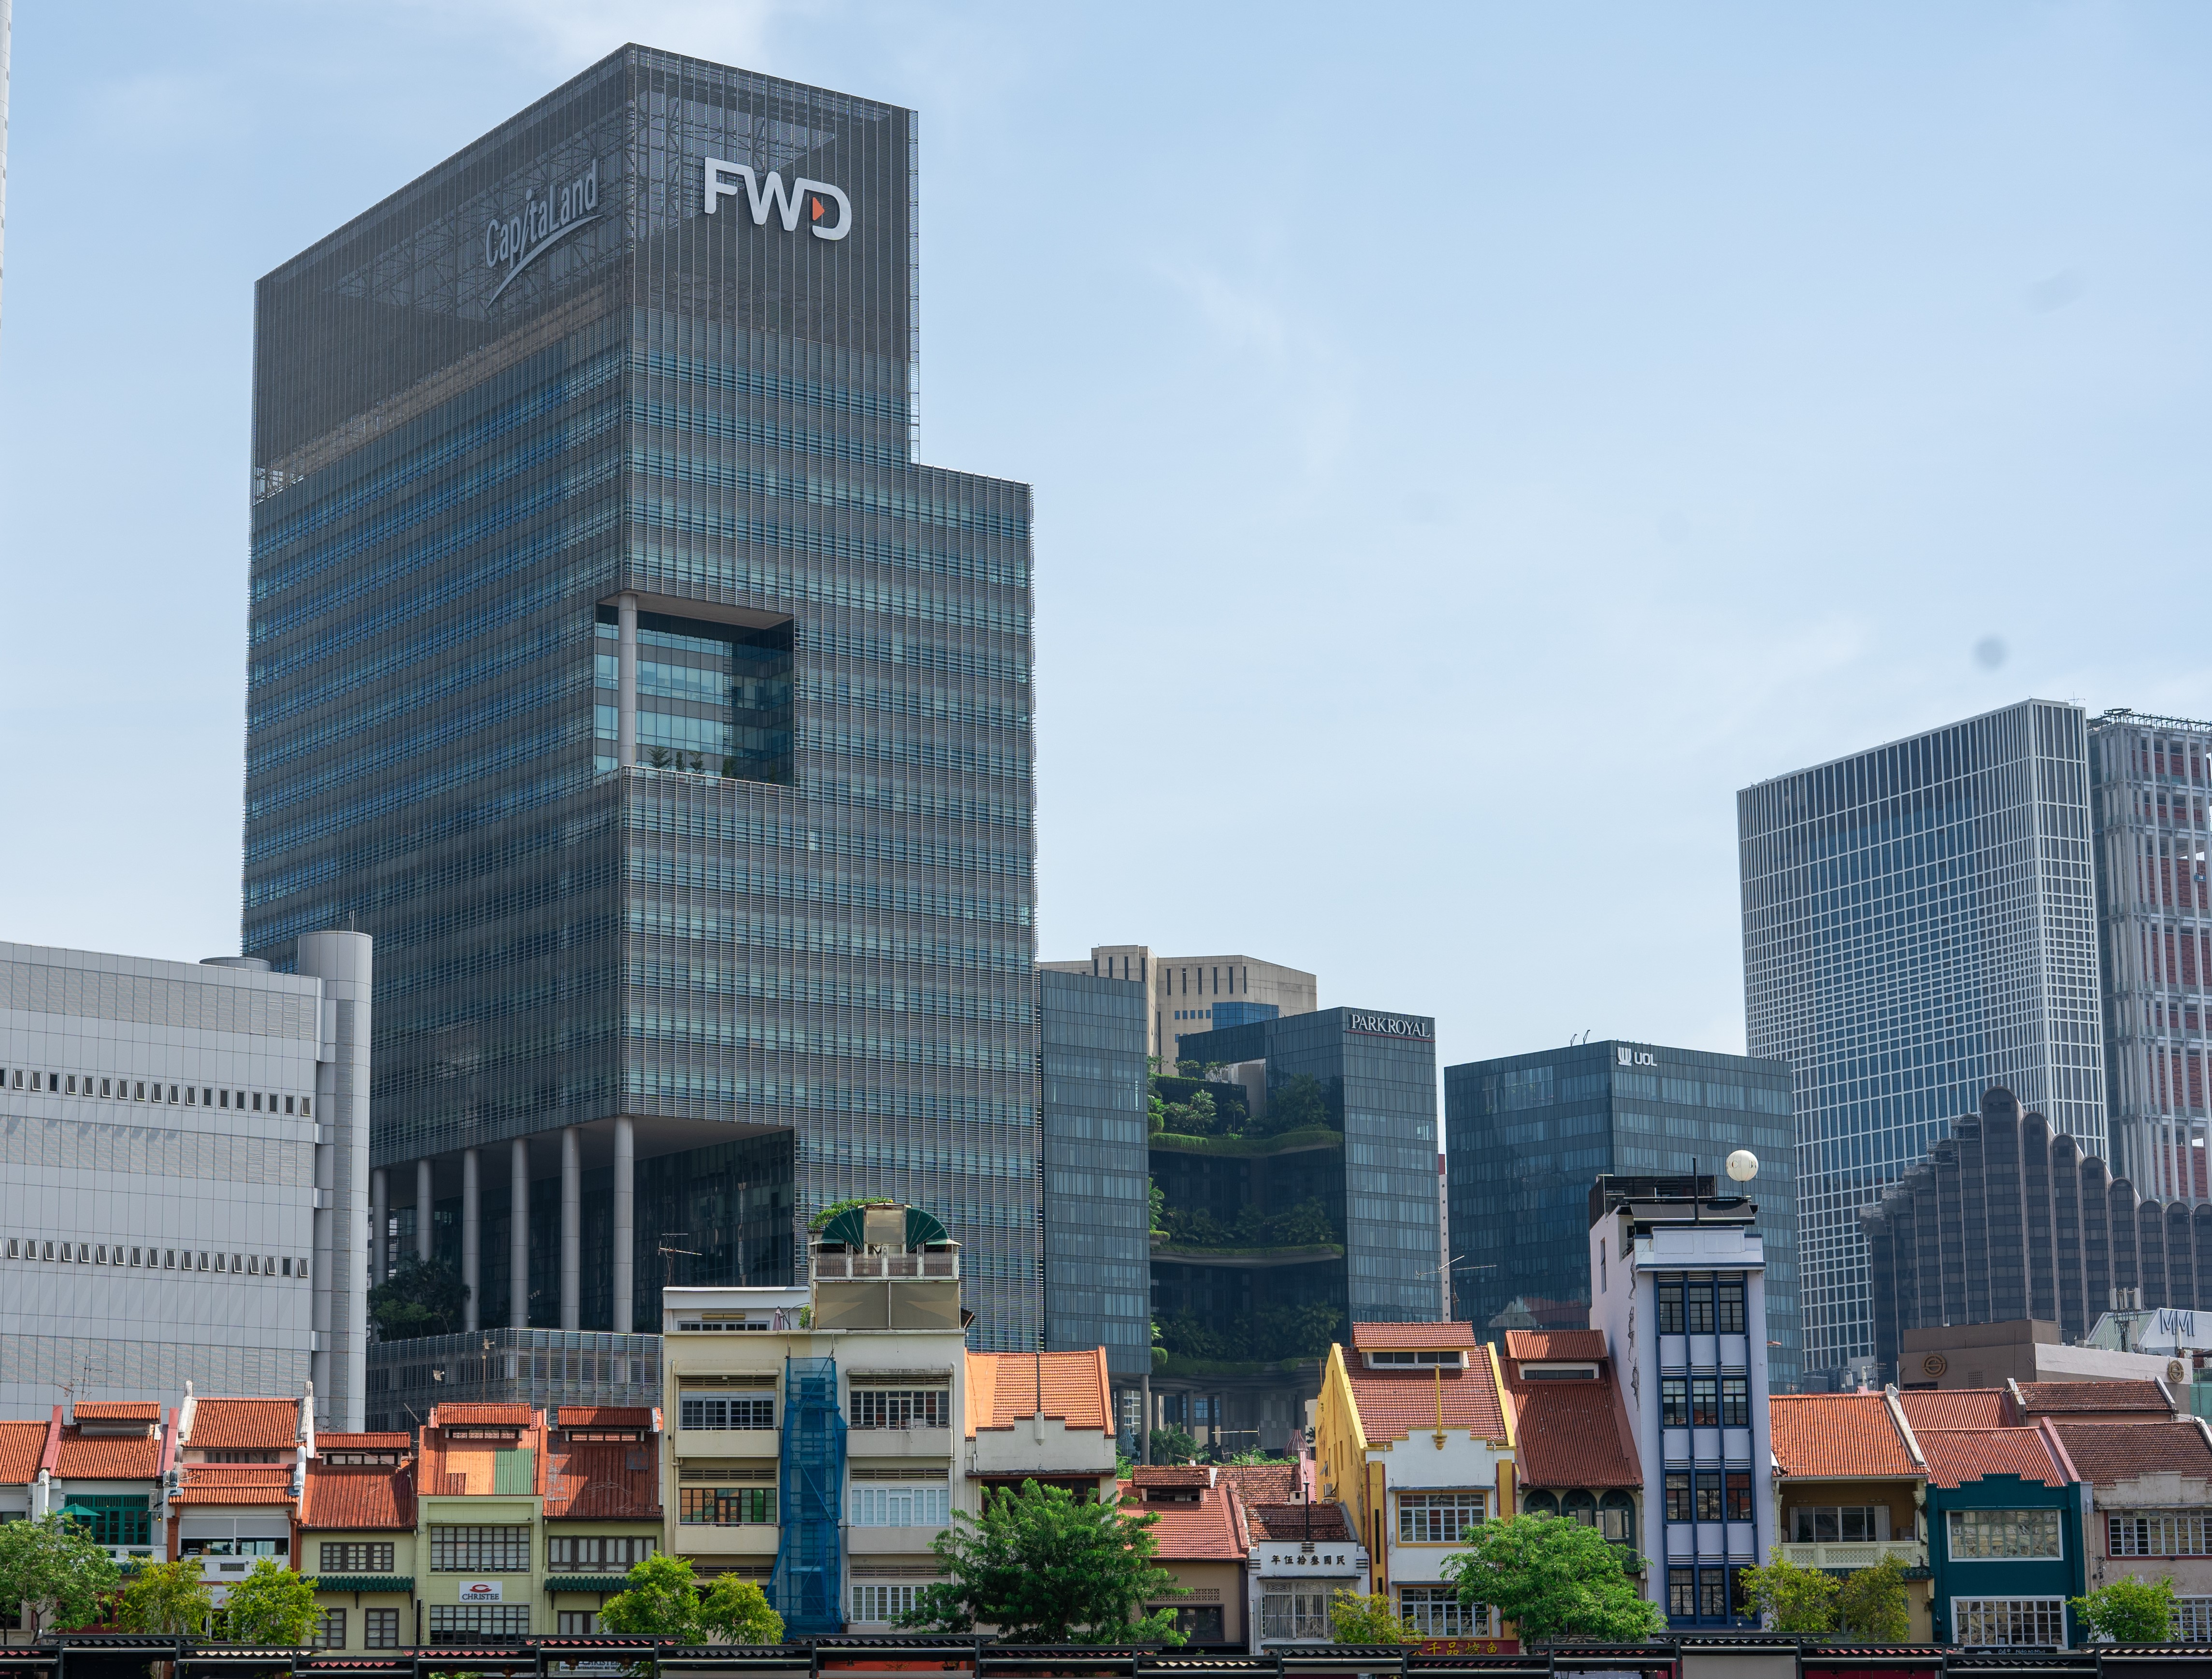 FWD hoàn tất mua Vietcombank-Cardif